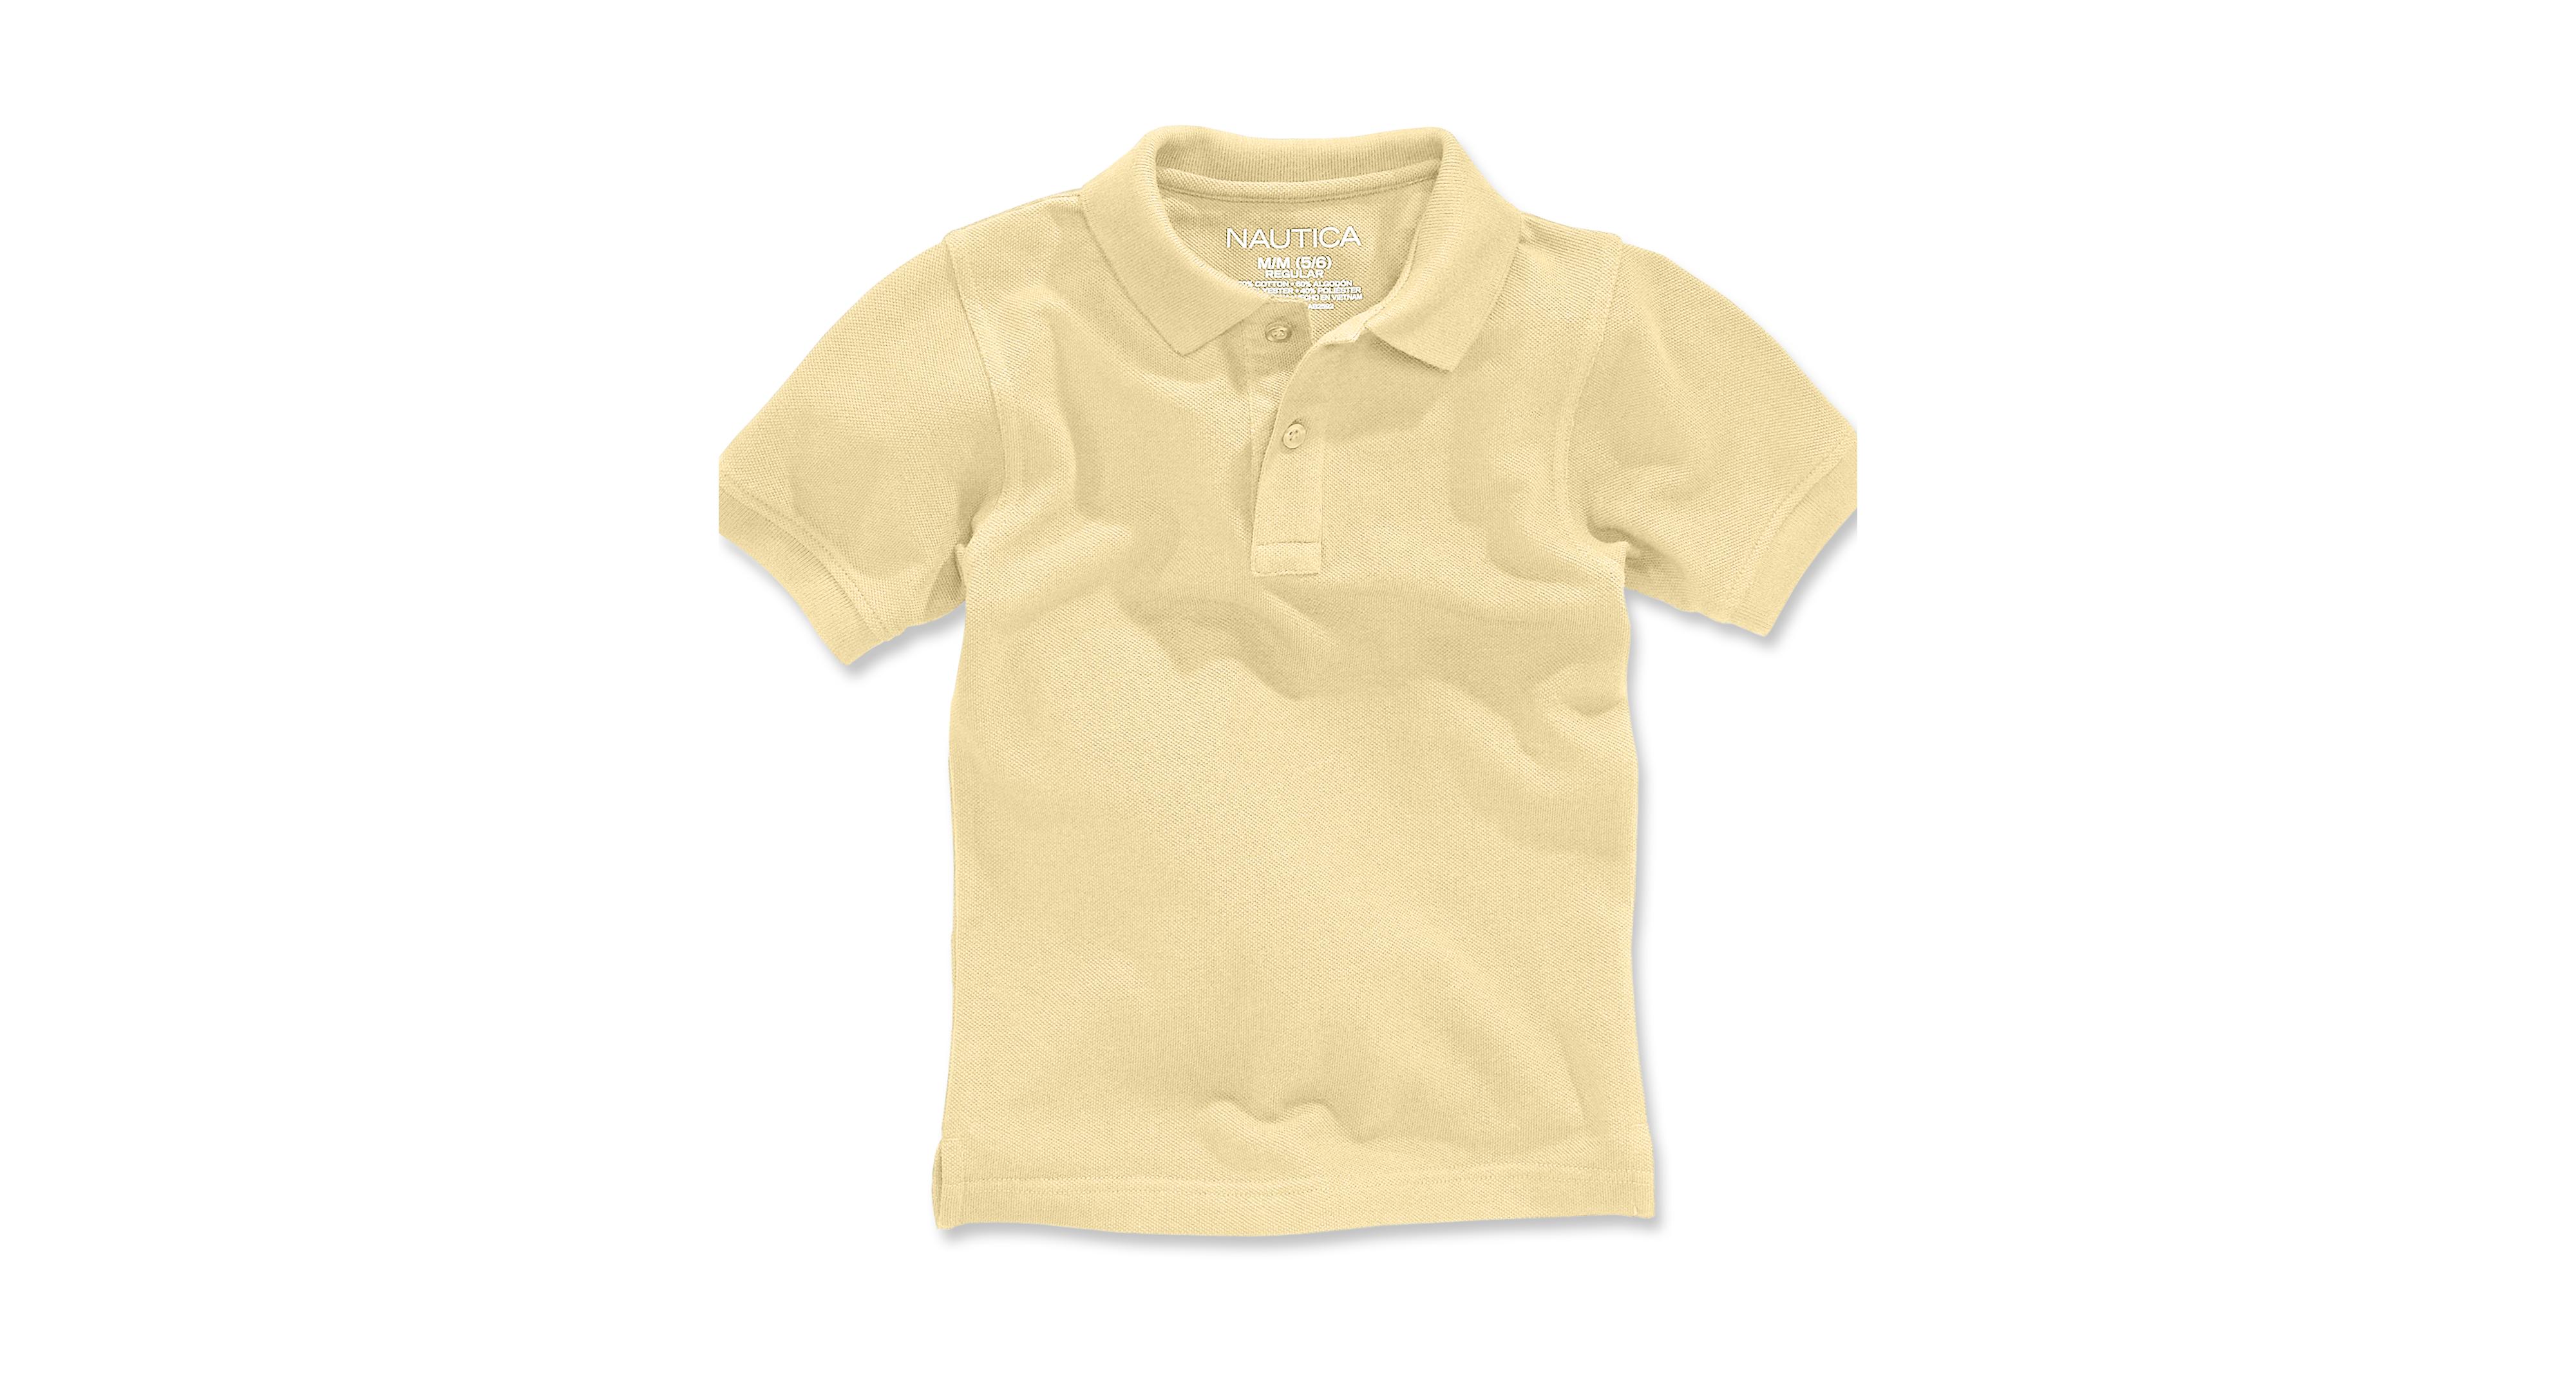 Nautica Little Boys' Uniform Polo